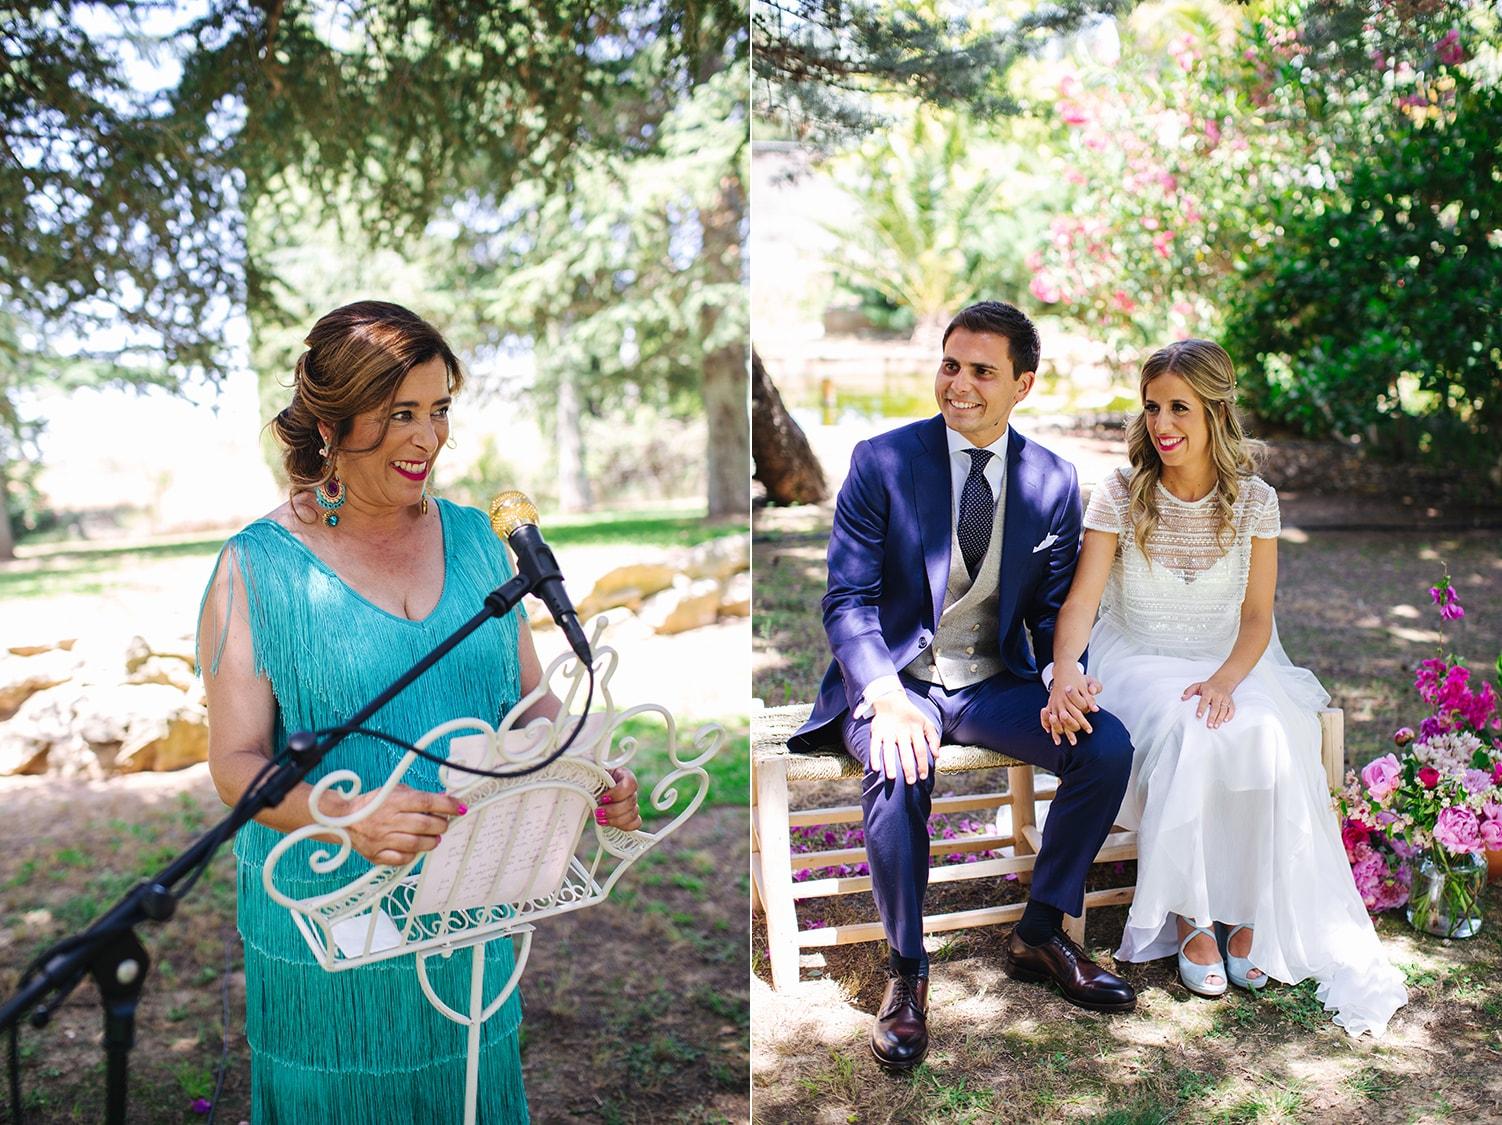 paulagfurio_bouganvillea_wedding_spain_019.jpg